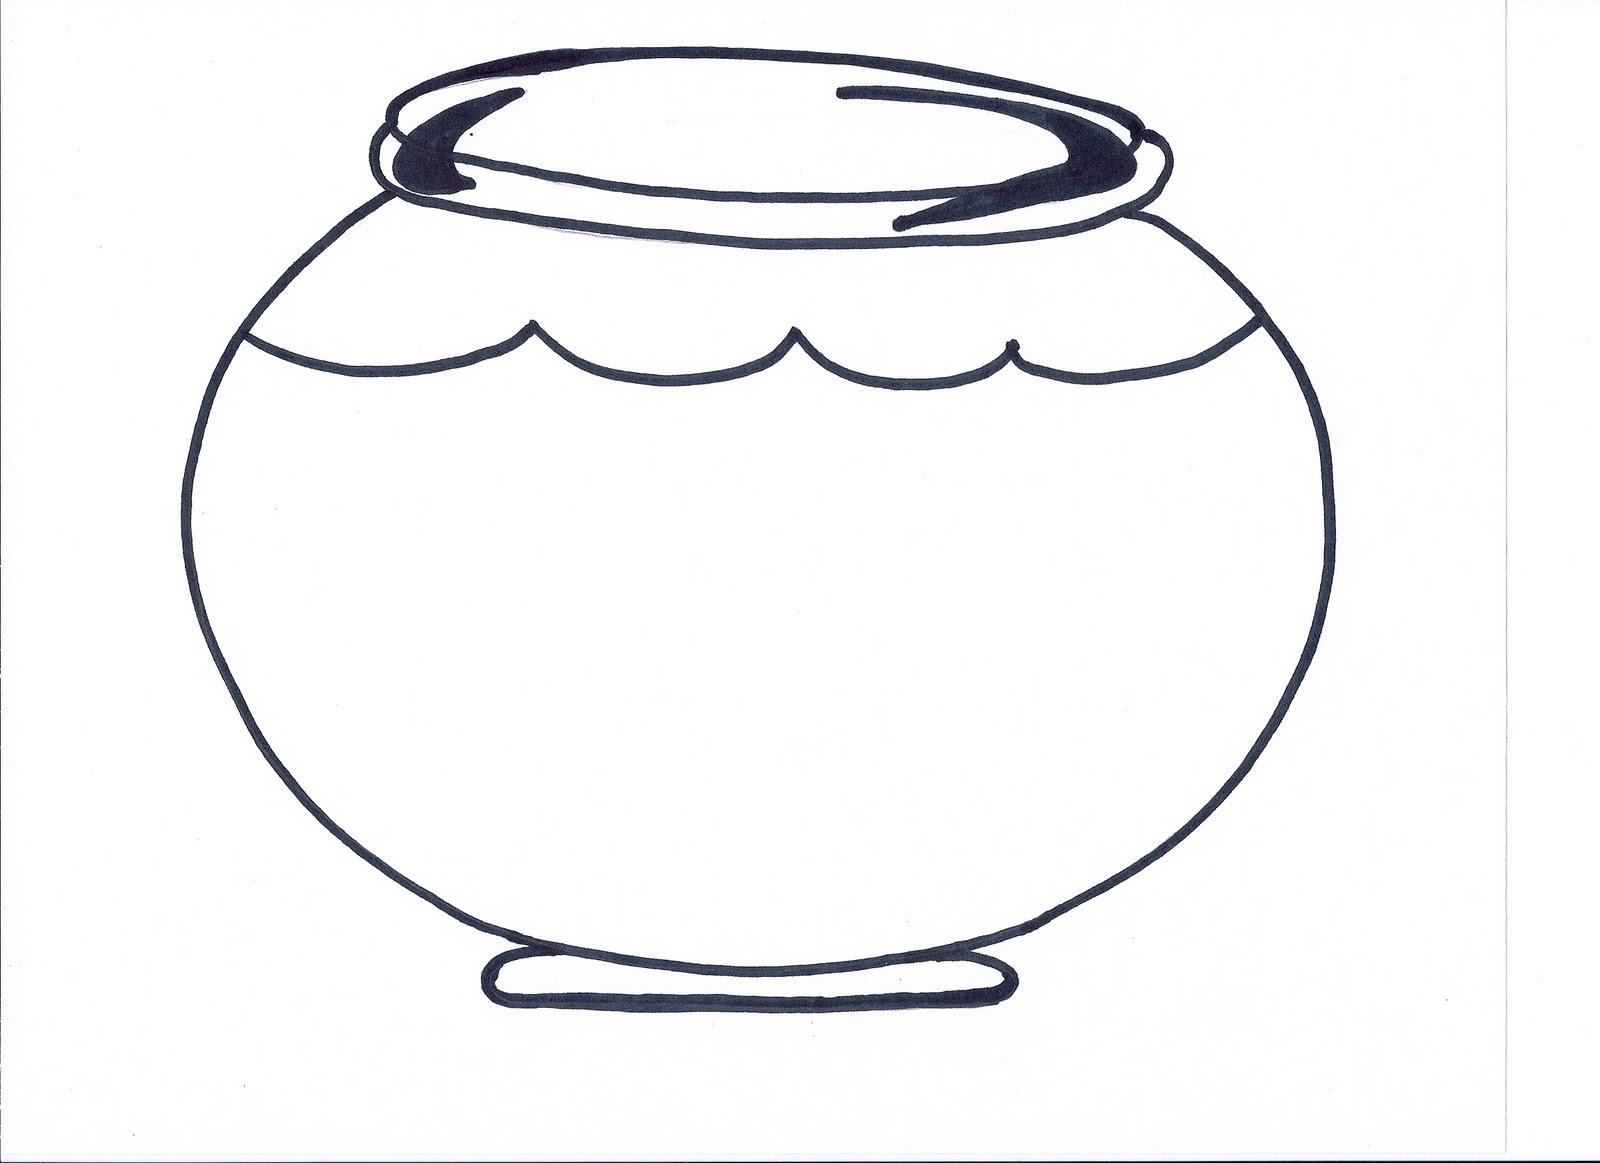 Fishbowl clipart printable. Free fish bowl download